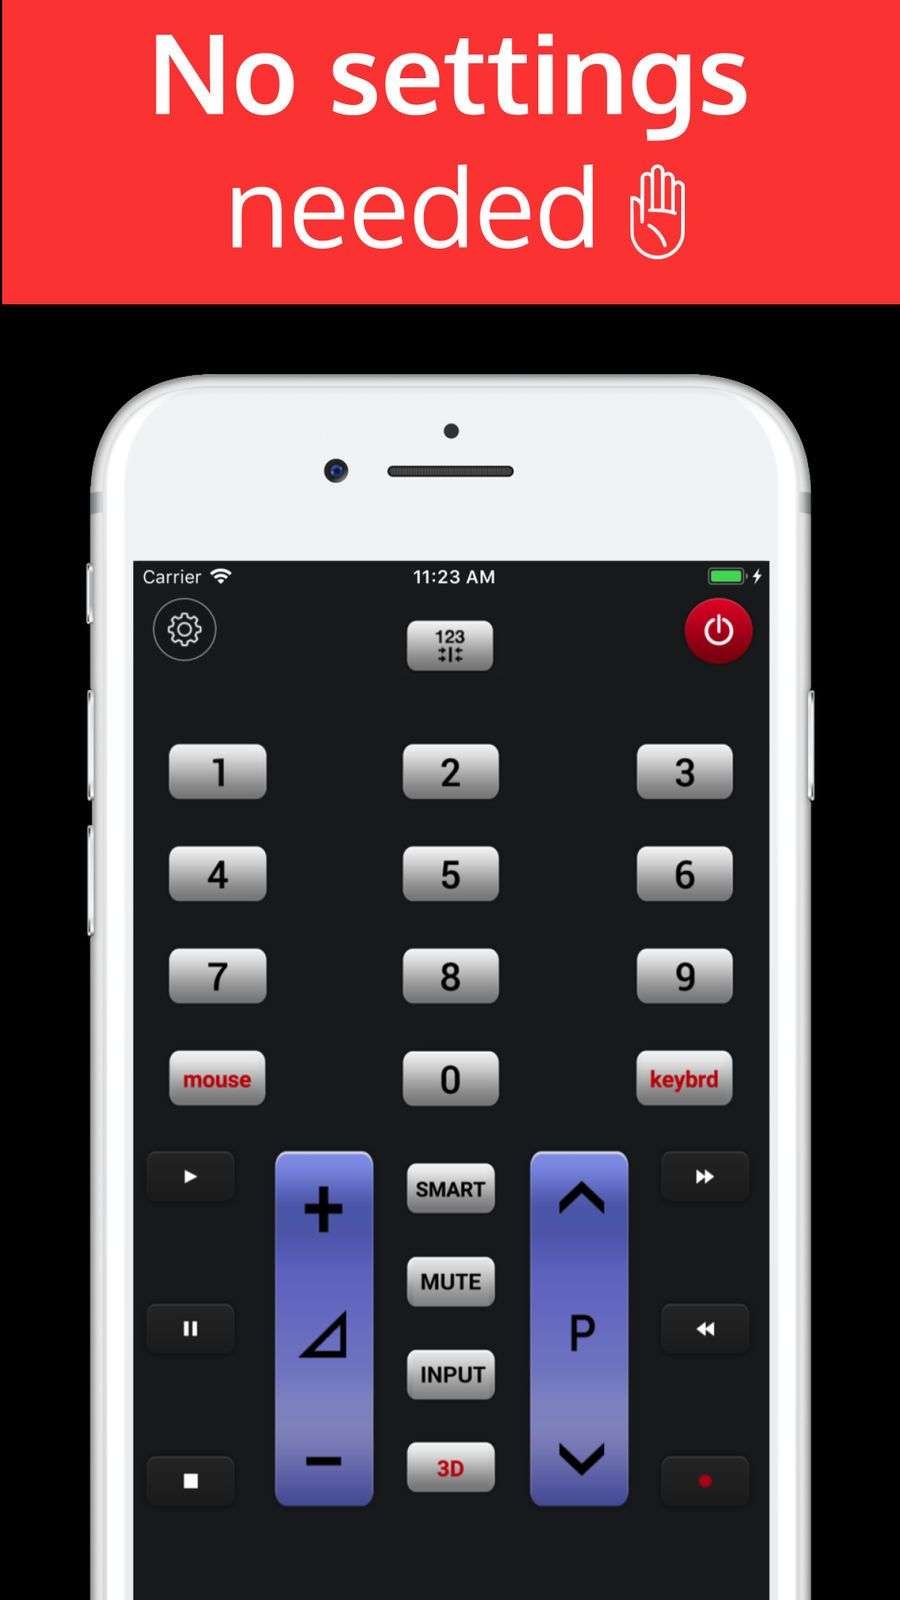 LGeeRemote Remote For LG TV Utilitiesteixeiraios